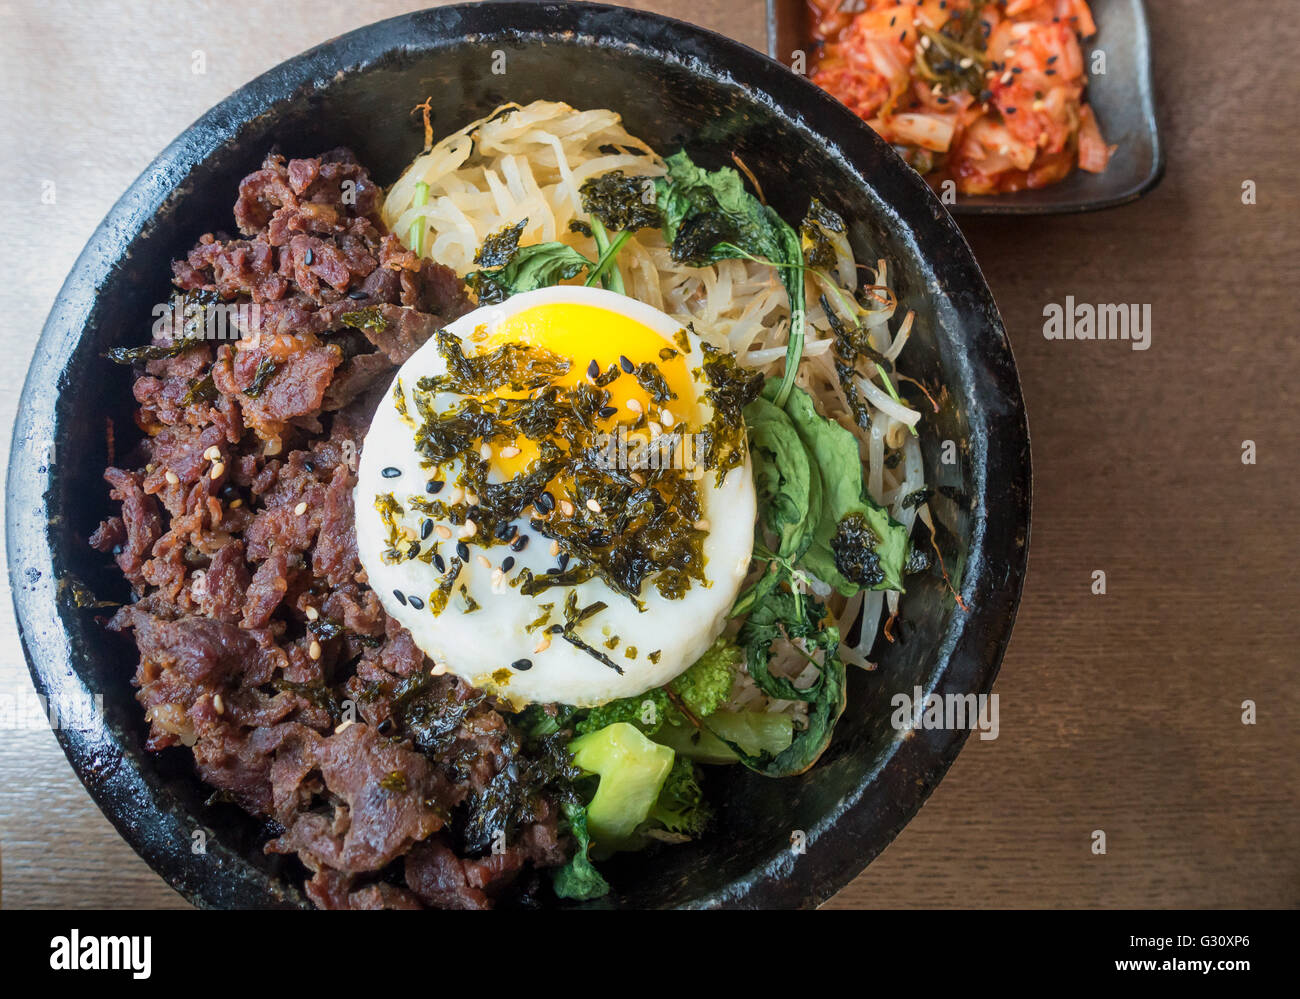 Korean Cuisine Bibimbap Kimchi Beef Greens Rice Noodles And An Stock Photo Alamy